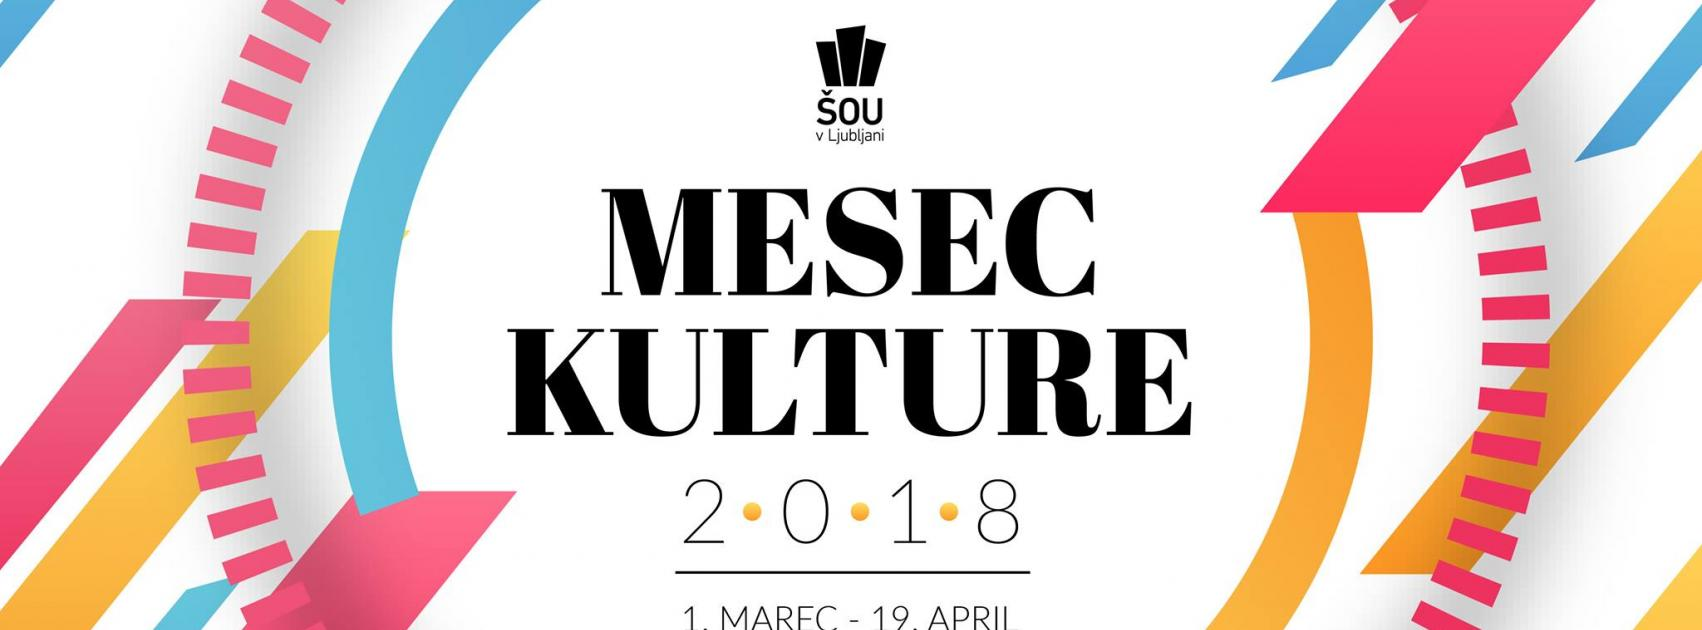 mesec_kulture_0.jpg